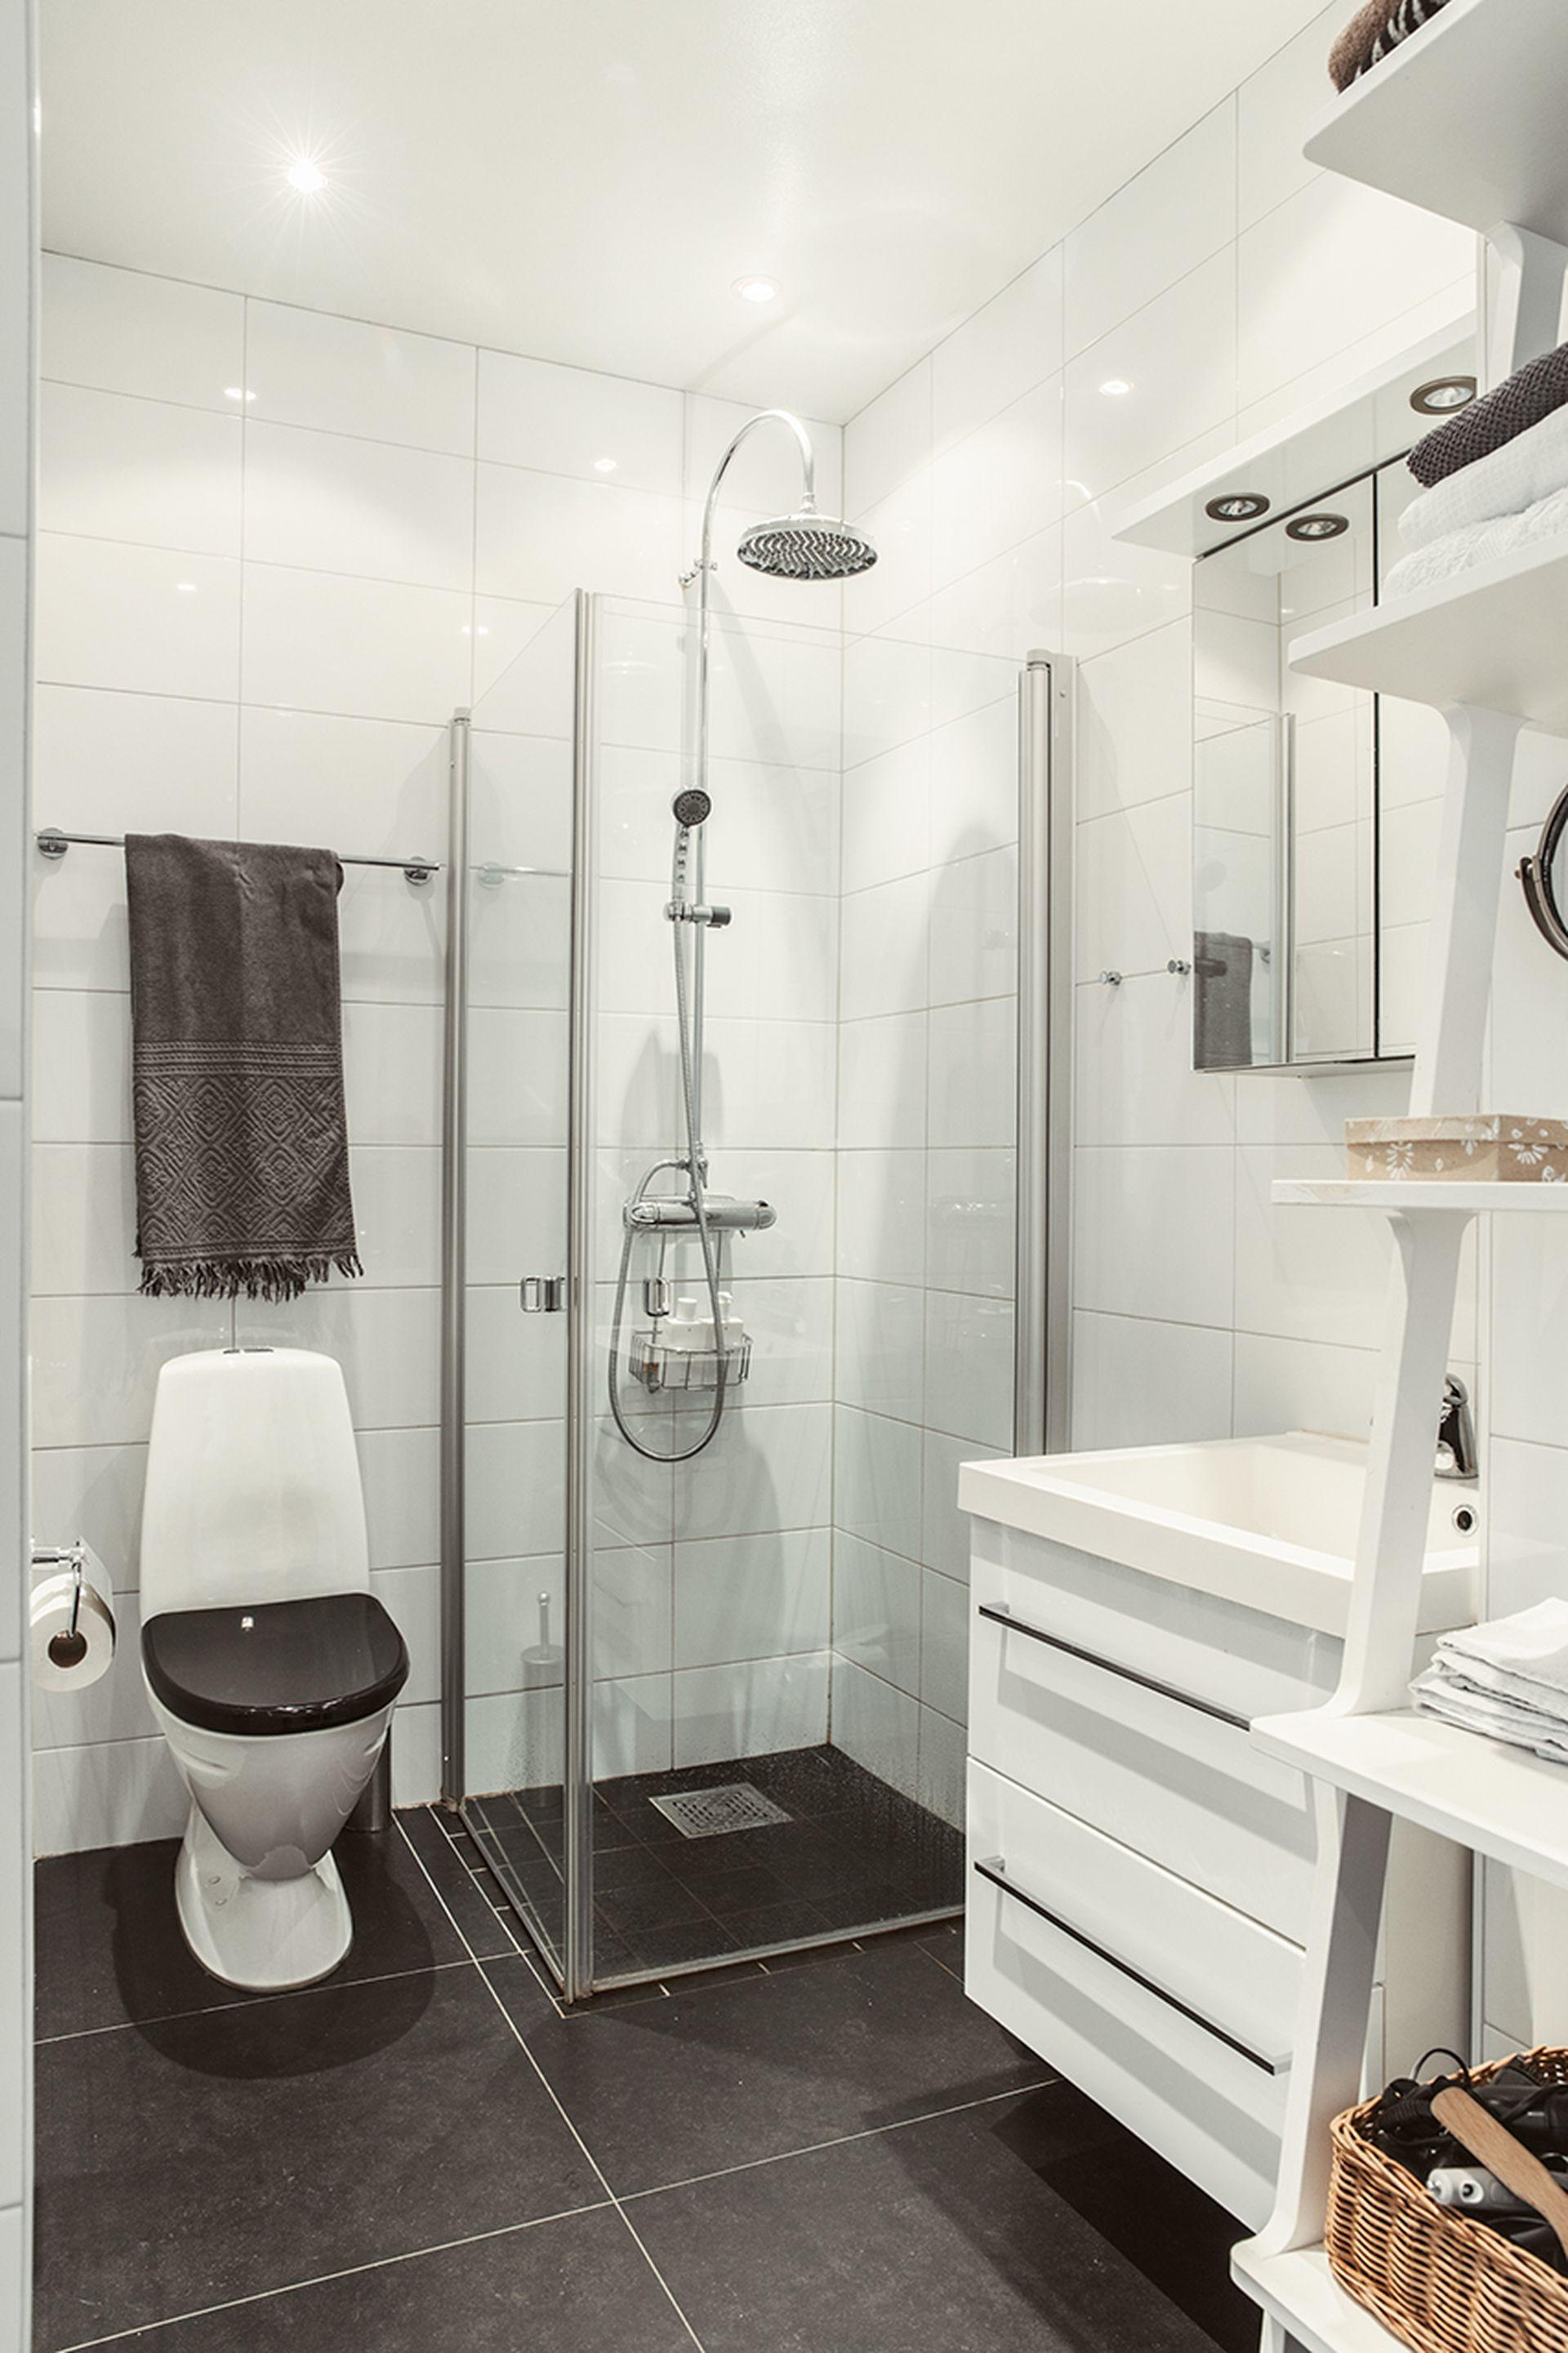 Pin by Lollo Nordin on Läggan | Pinterest | Contemporary bathrooms ...